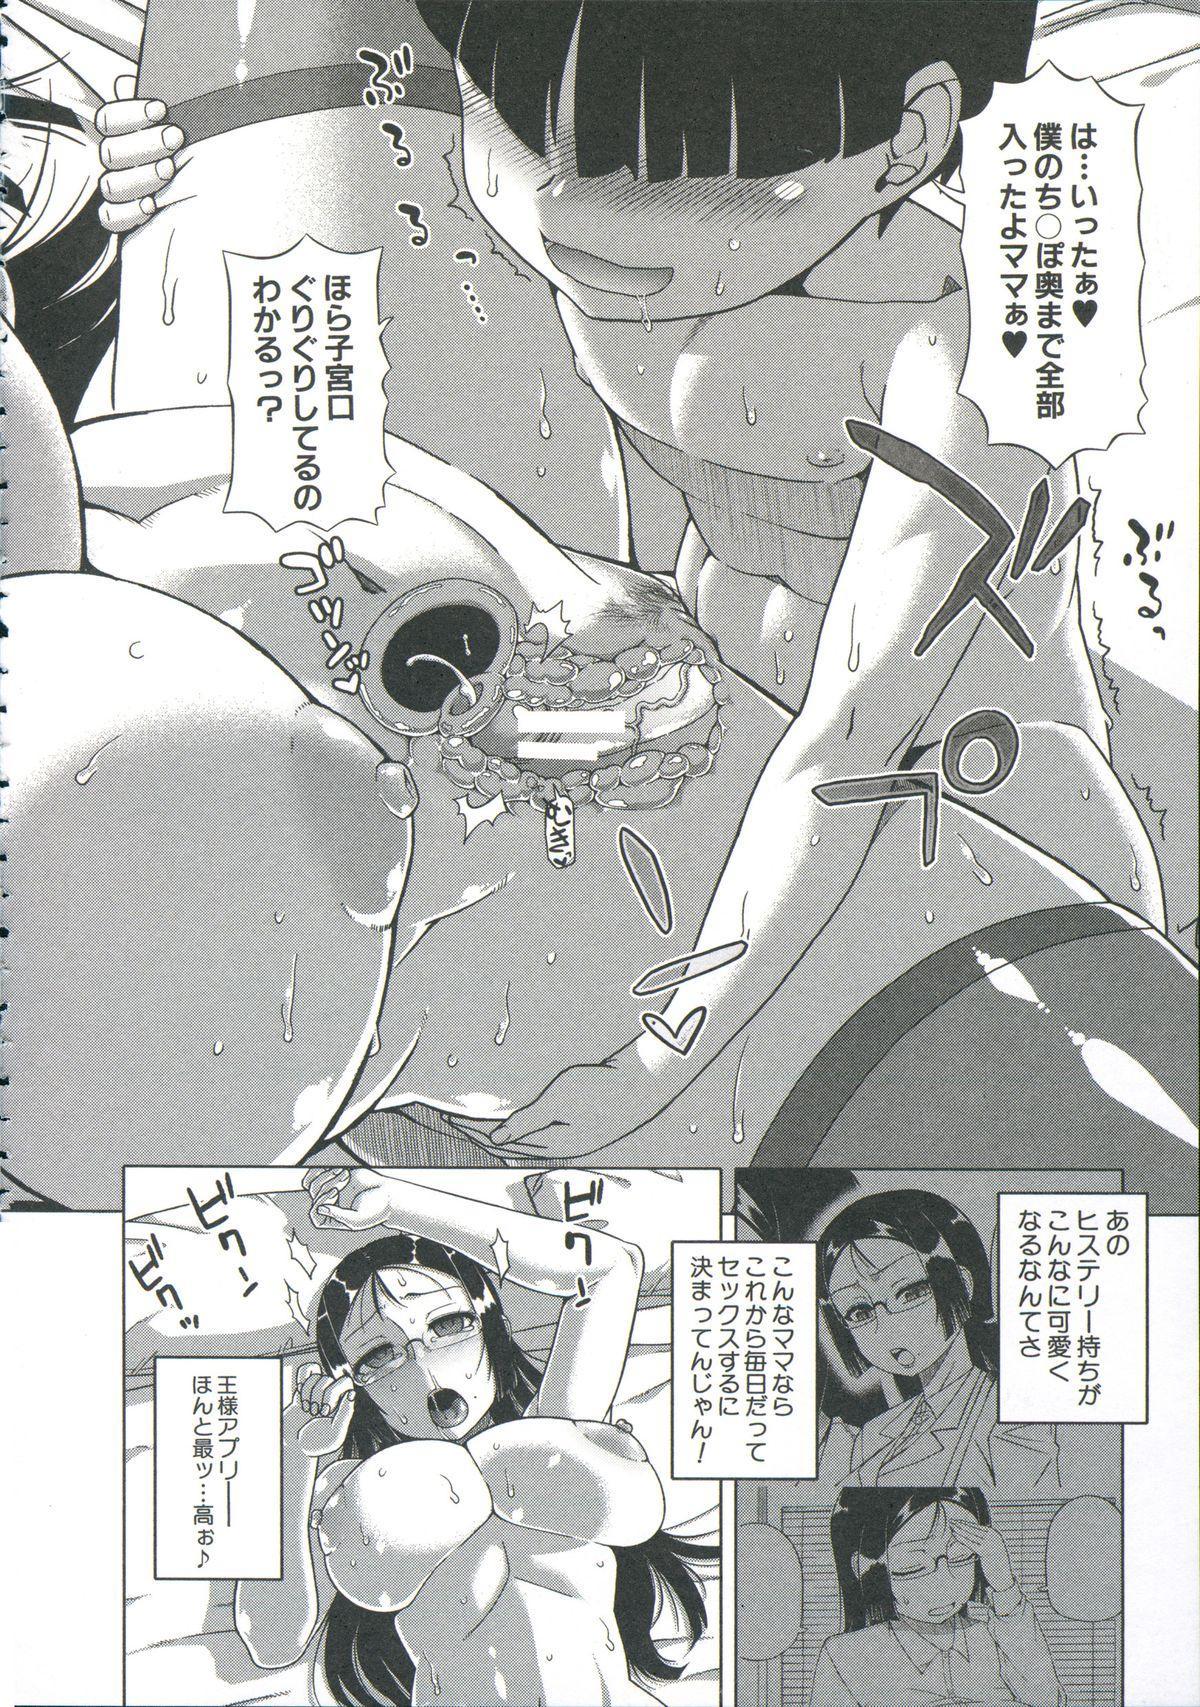 [Takatsu] Ou-sama Appli - King App 28